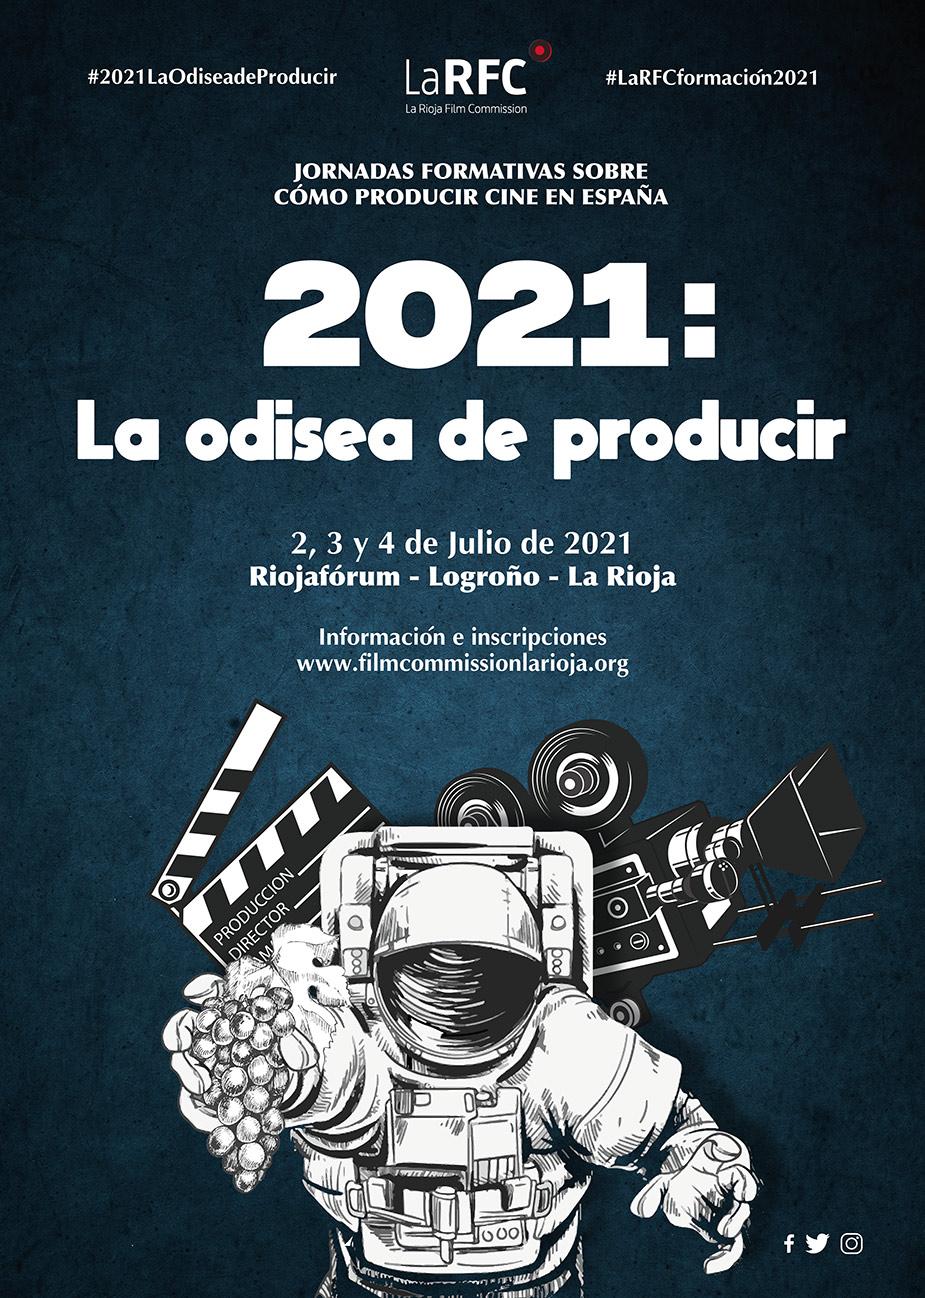 2021: La Odisea de Producir